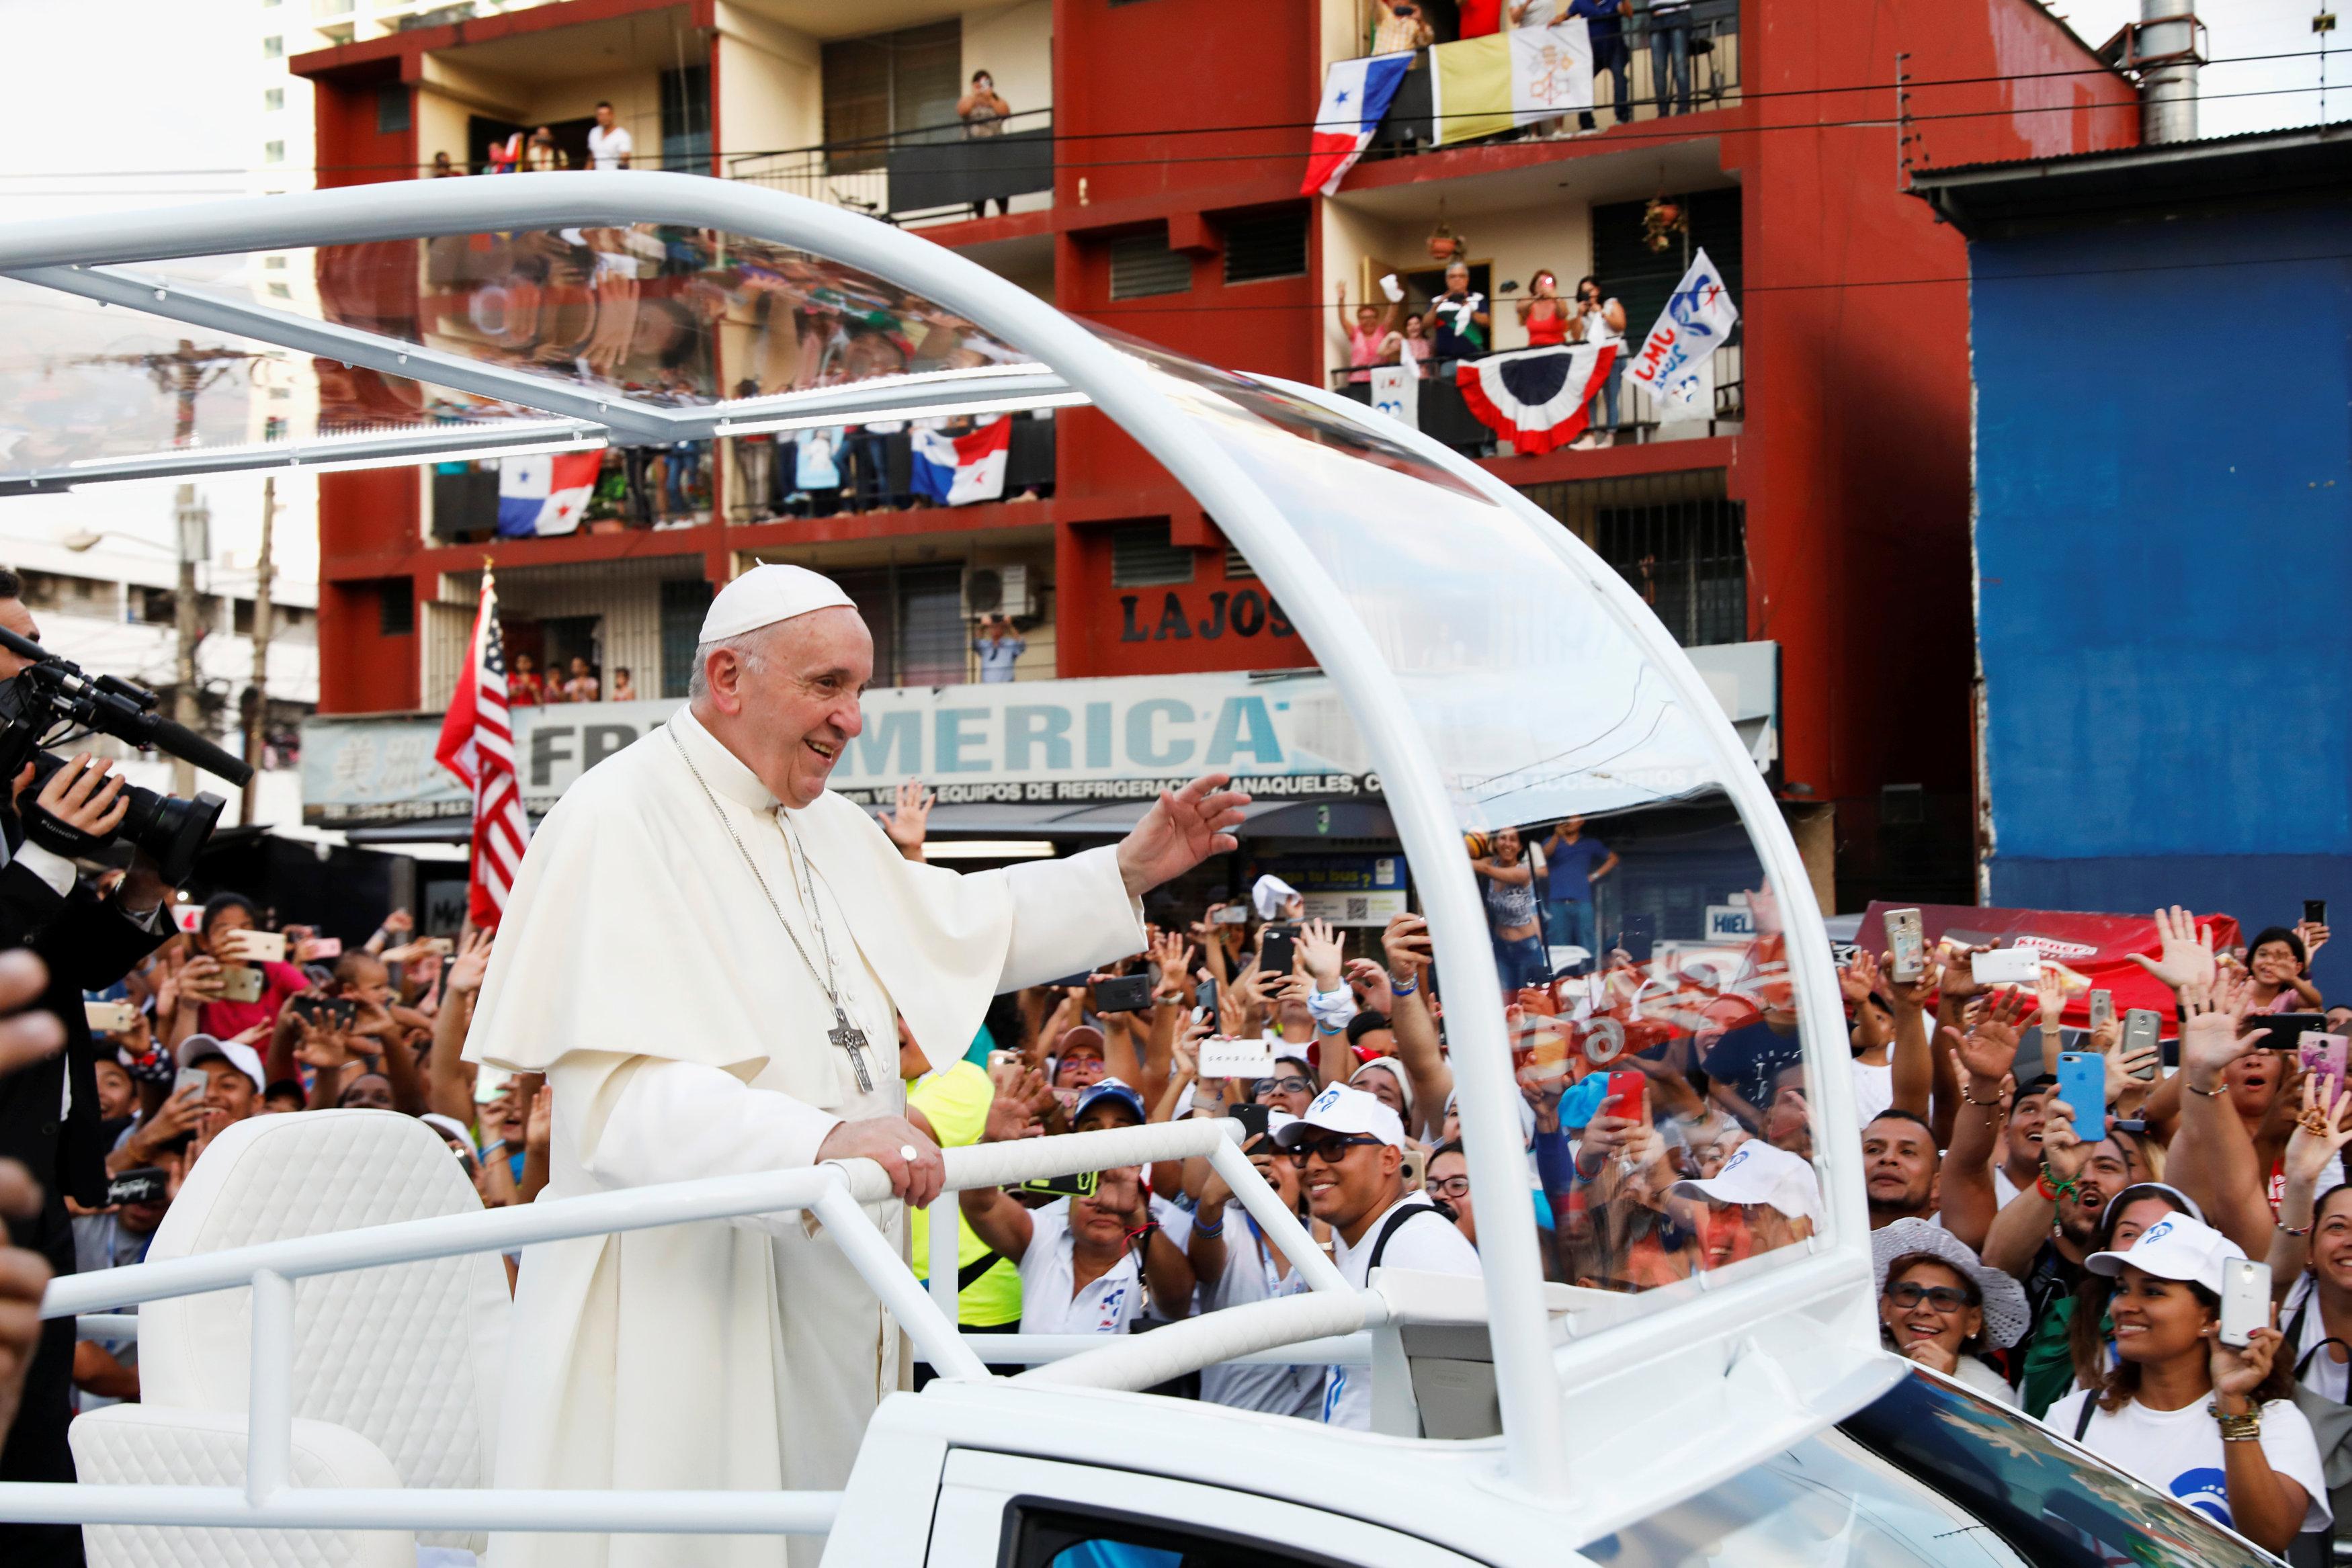 استقبال حاشد لبابا الفاتيكان لدى وصوله بنما  (5)